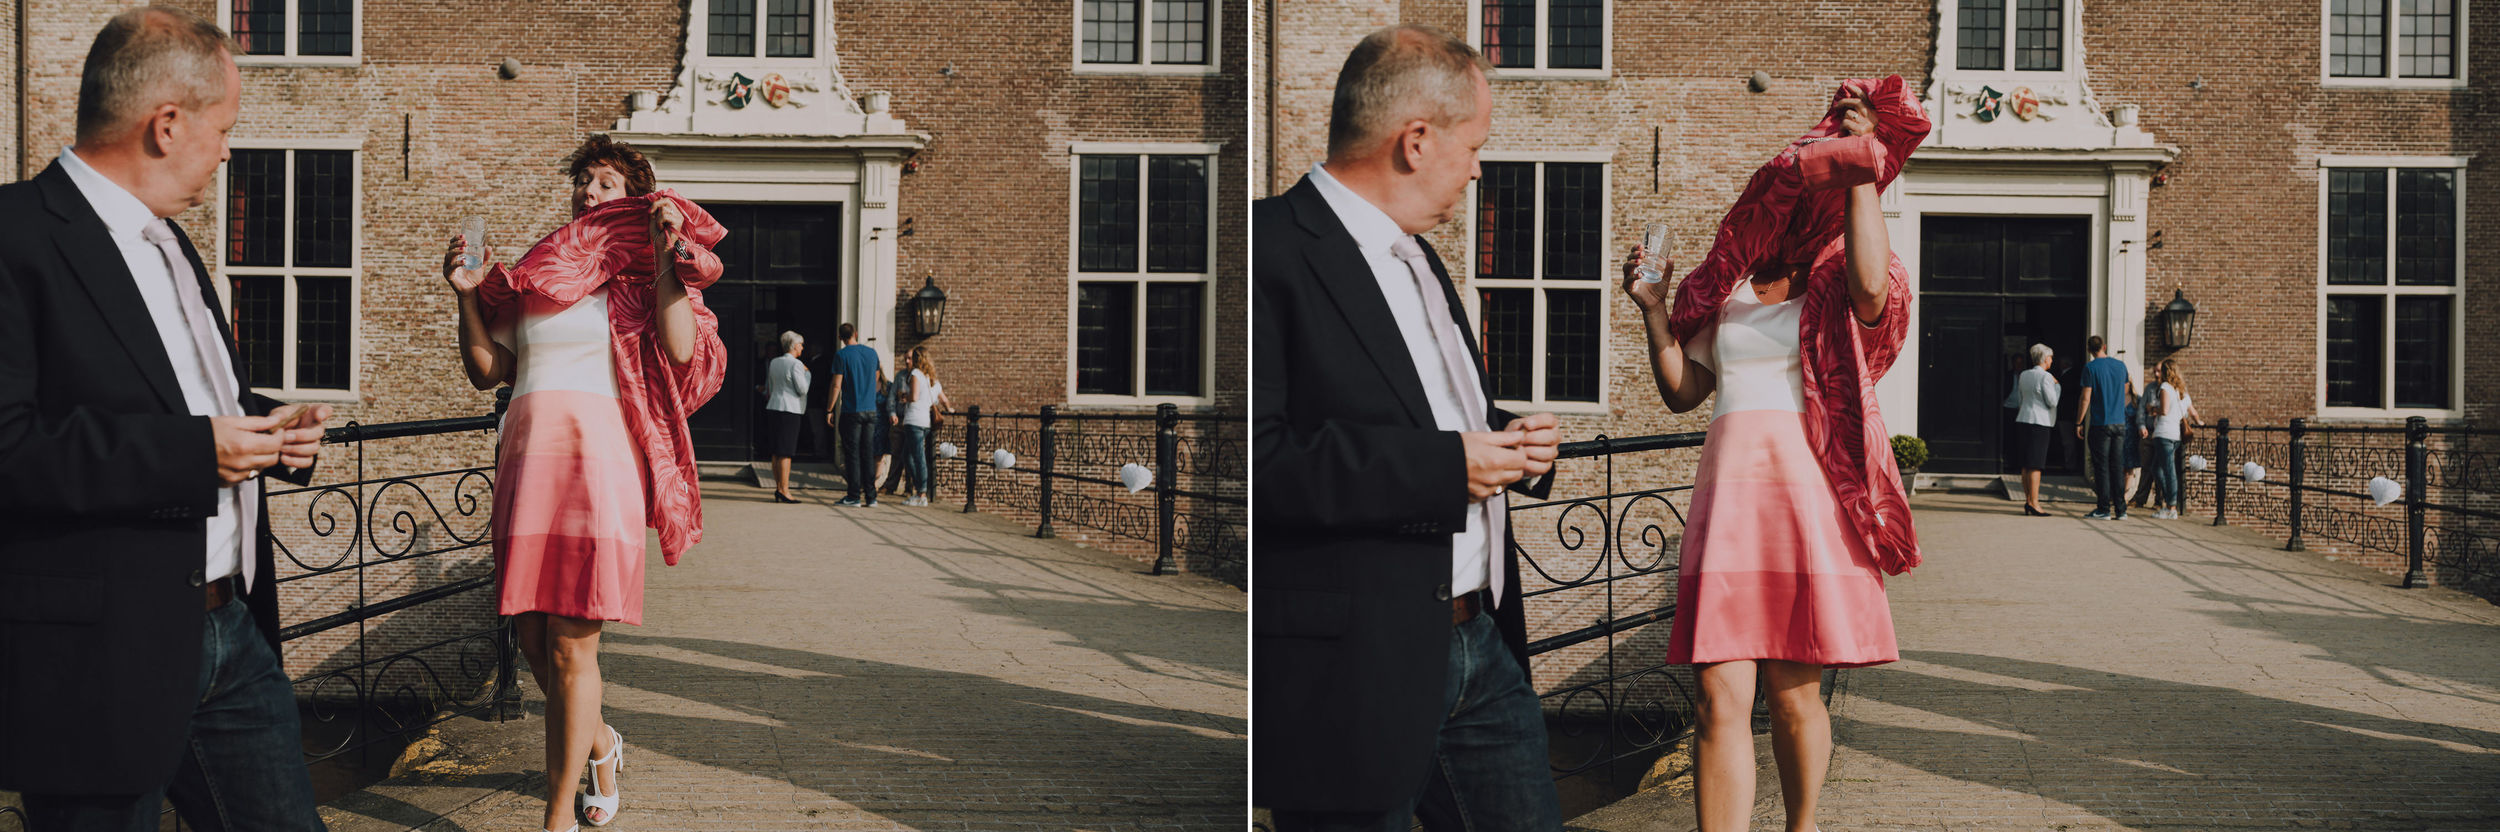 bruidsfotografie-amsterdam-utrecht-mark-hadden-wedding-photography-rowan-gideon-458 copy.jpg